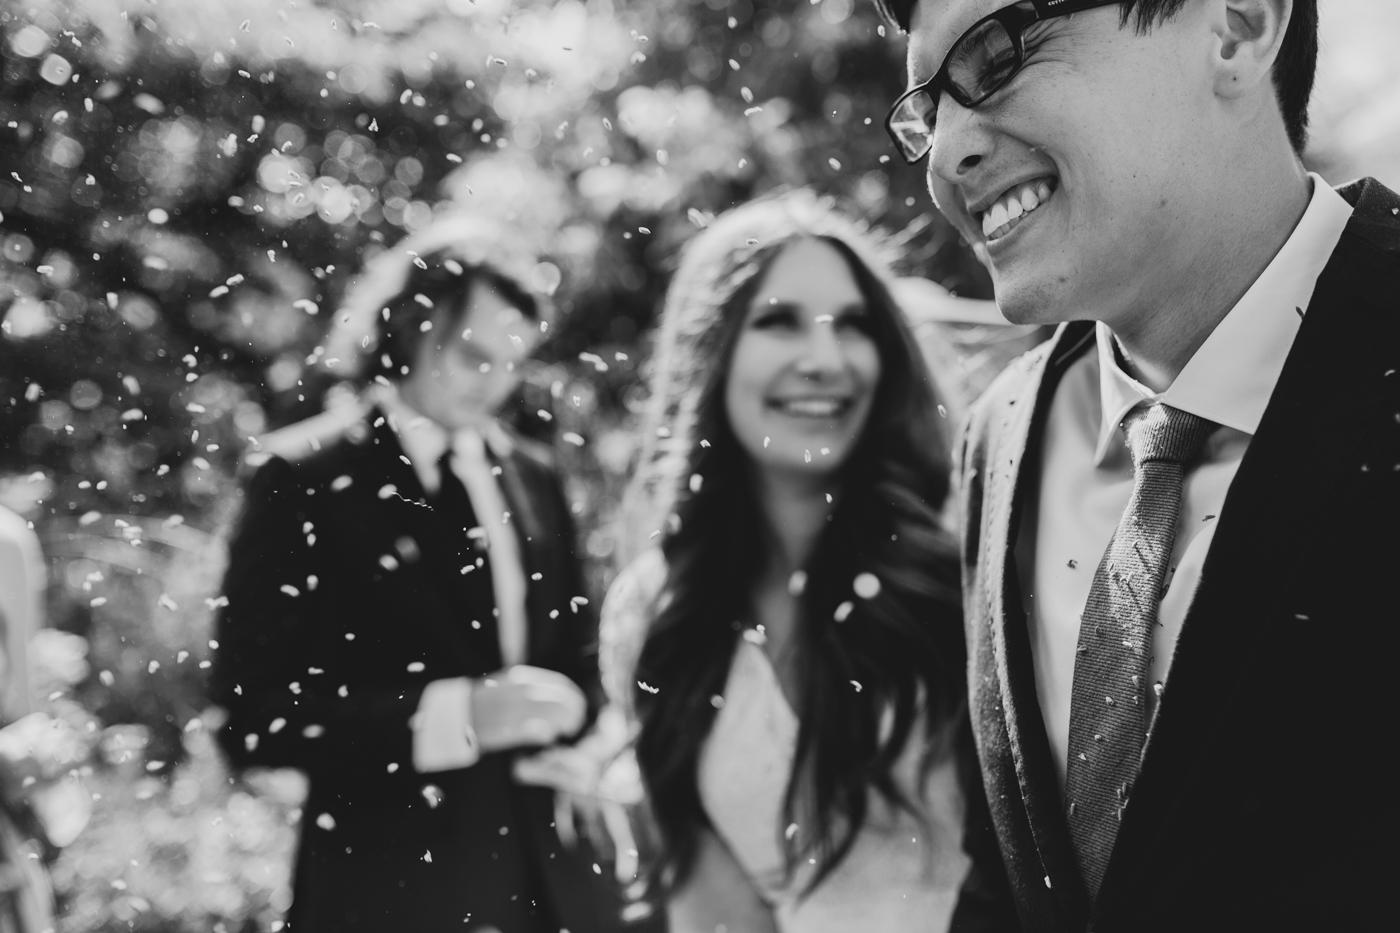 Ariana & Tim - Dunedin, New Zealand Wedding - Destination Wedding - Samantha Heather Photography-110.jpg